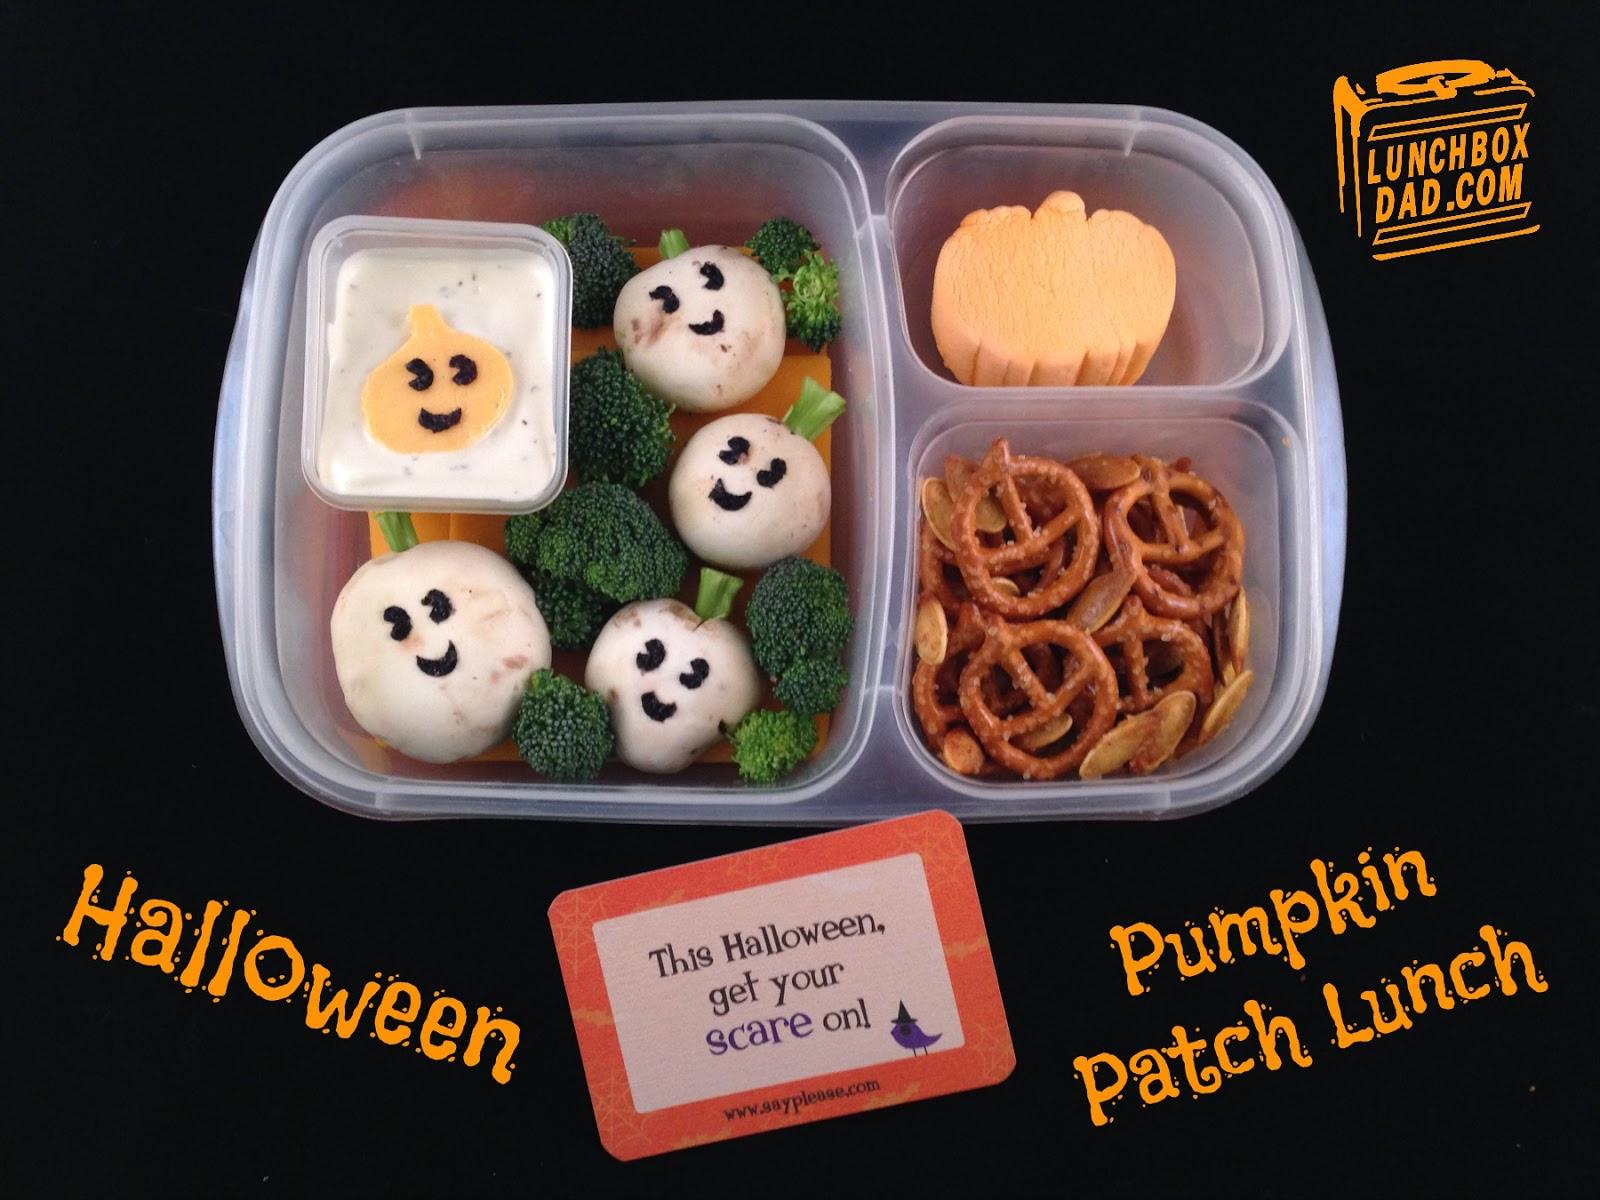 Lunchbox Dad: Halloween Pumpkin Patch Lunch